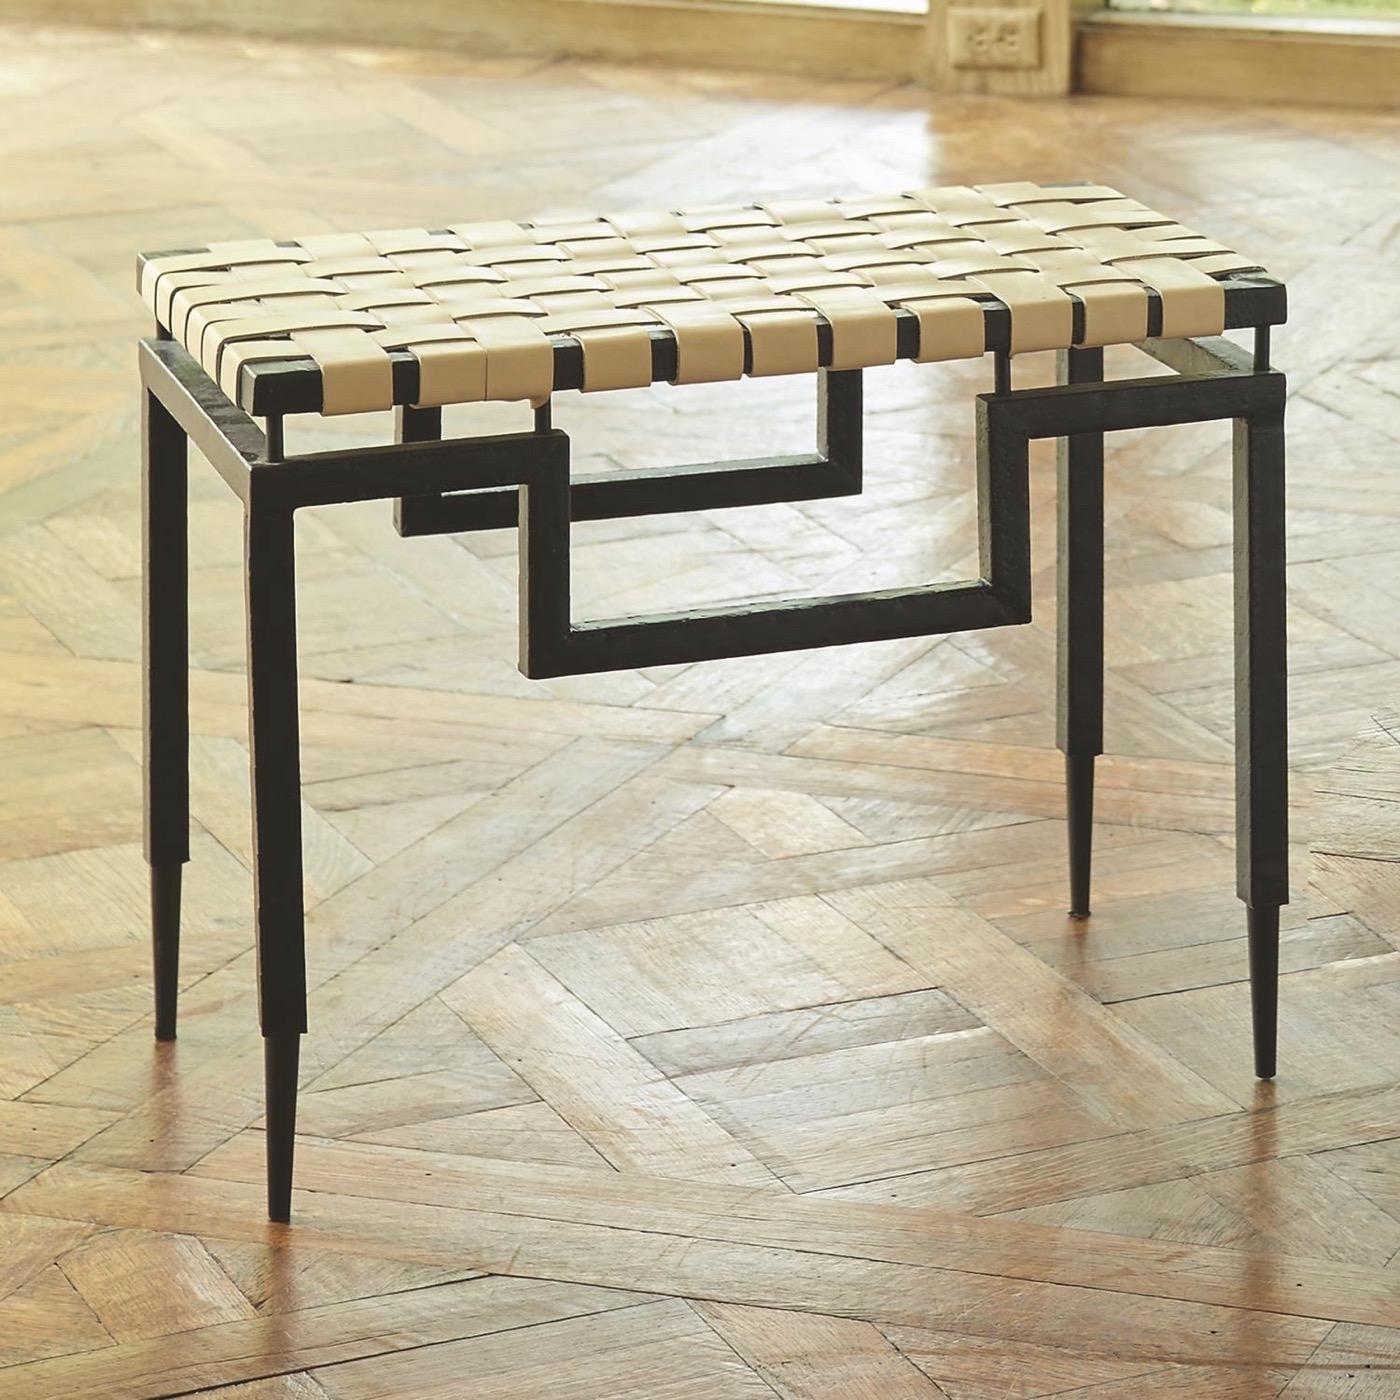 Rafi Leather & Iron Bench